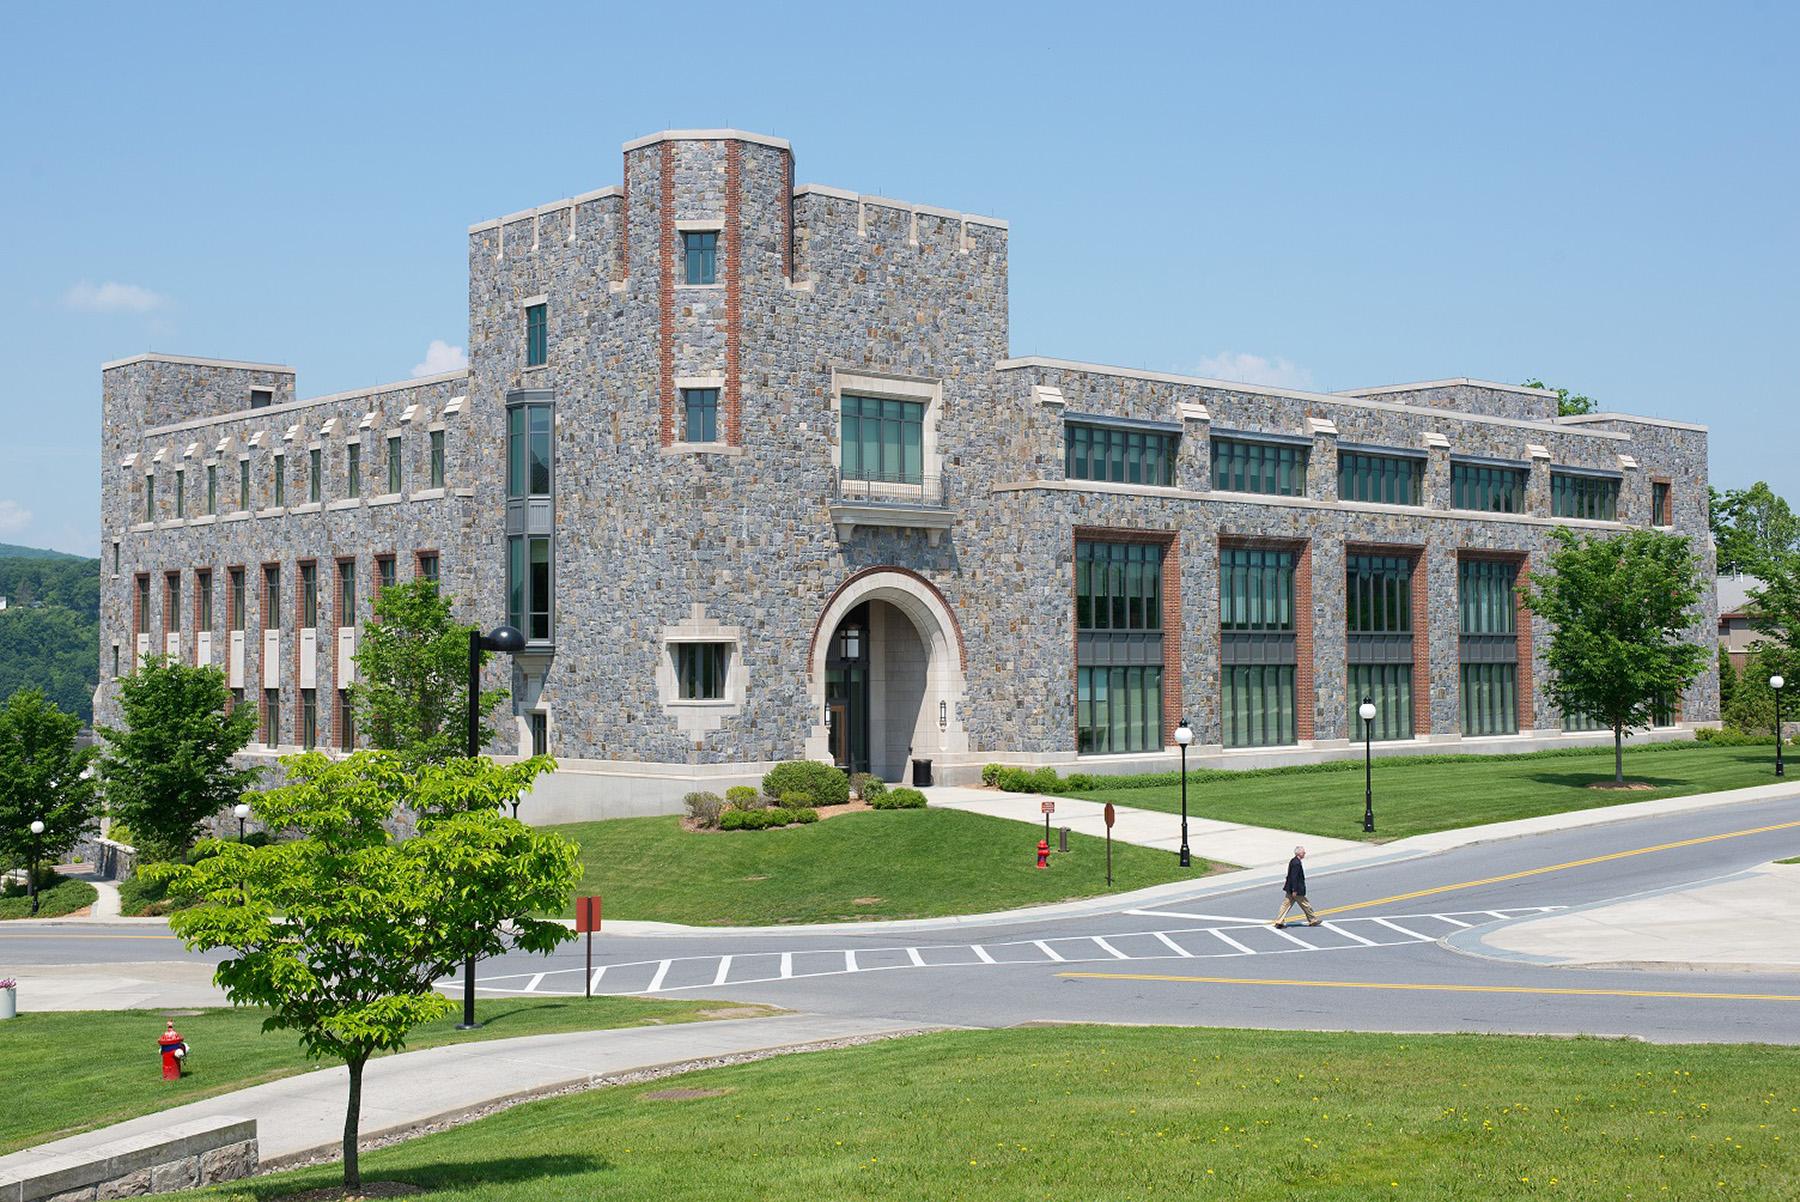 marist college stone building